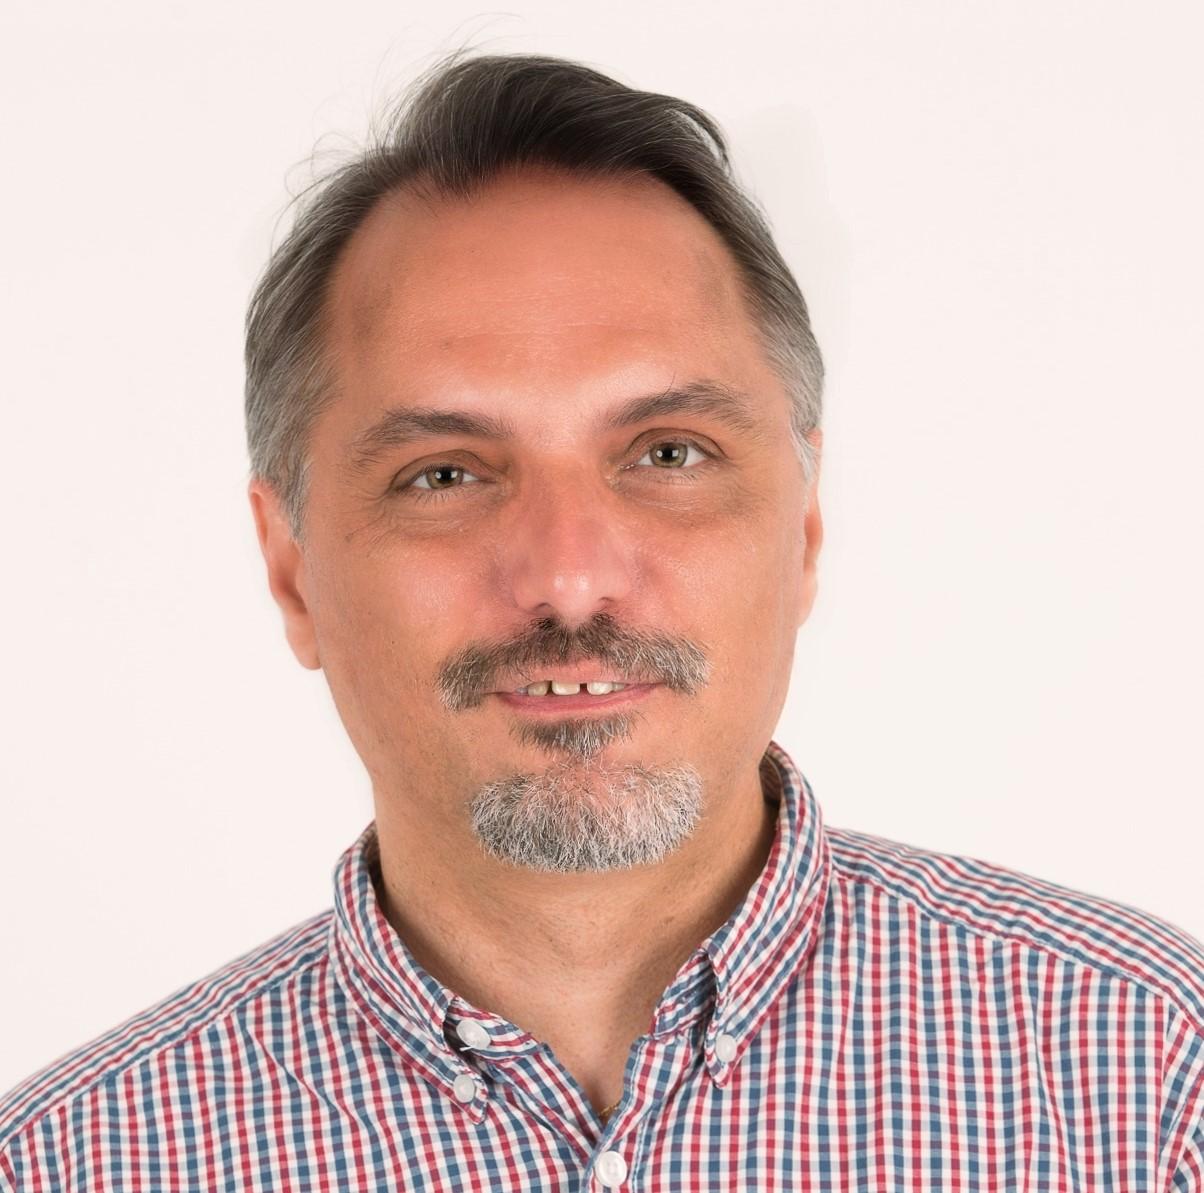 Иван Филдишев